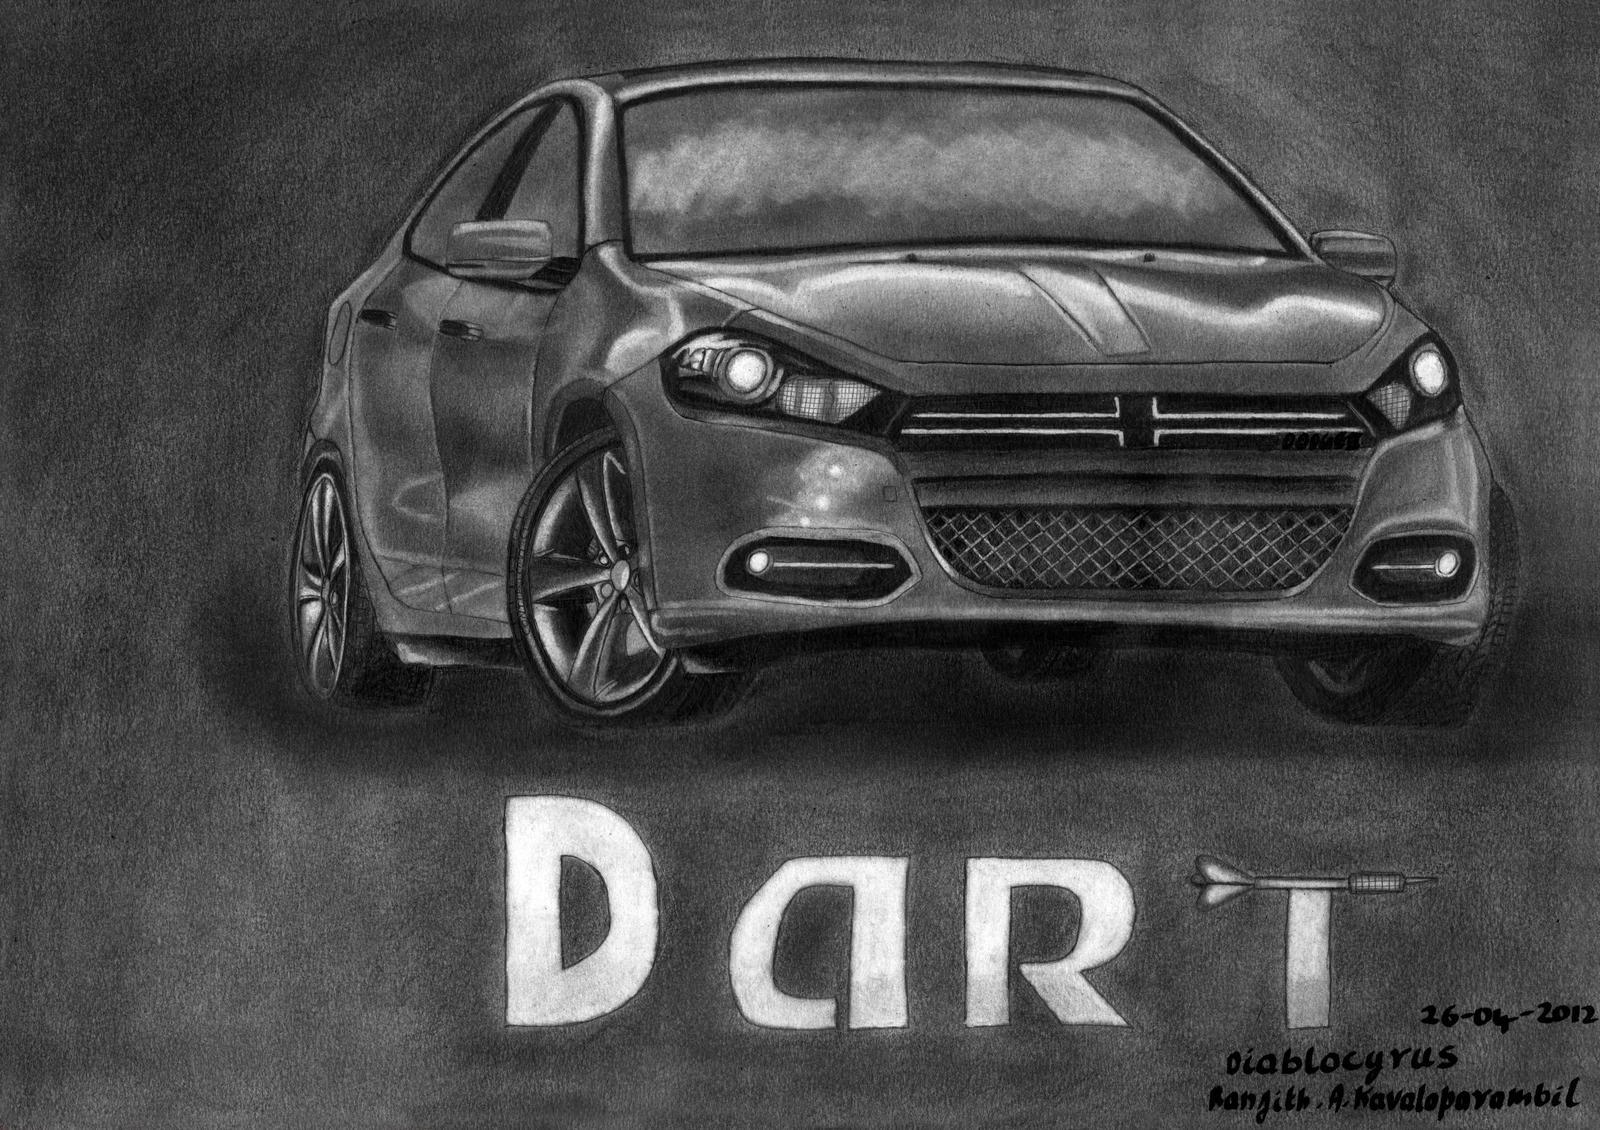 Dart Dodge 4 Photo Realistic Pencil sketch by diablocyrus